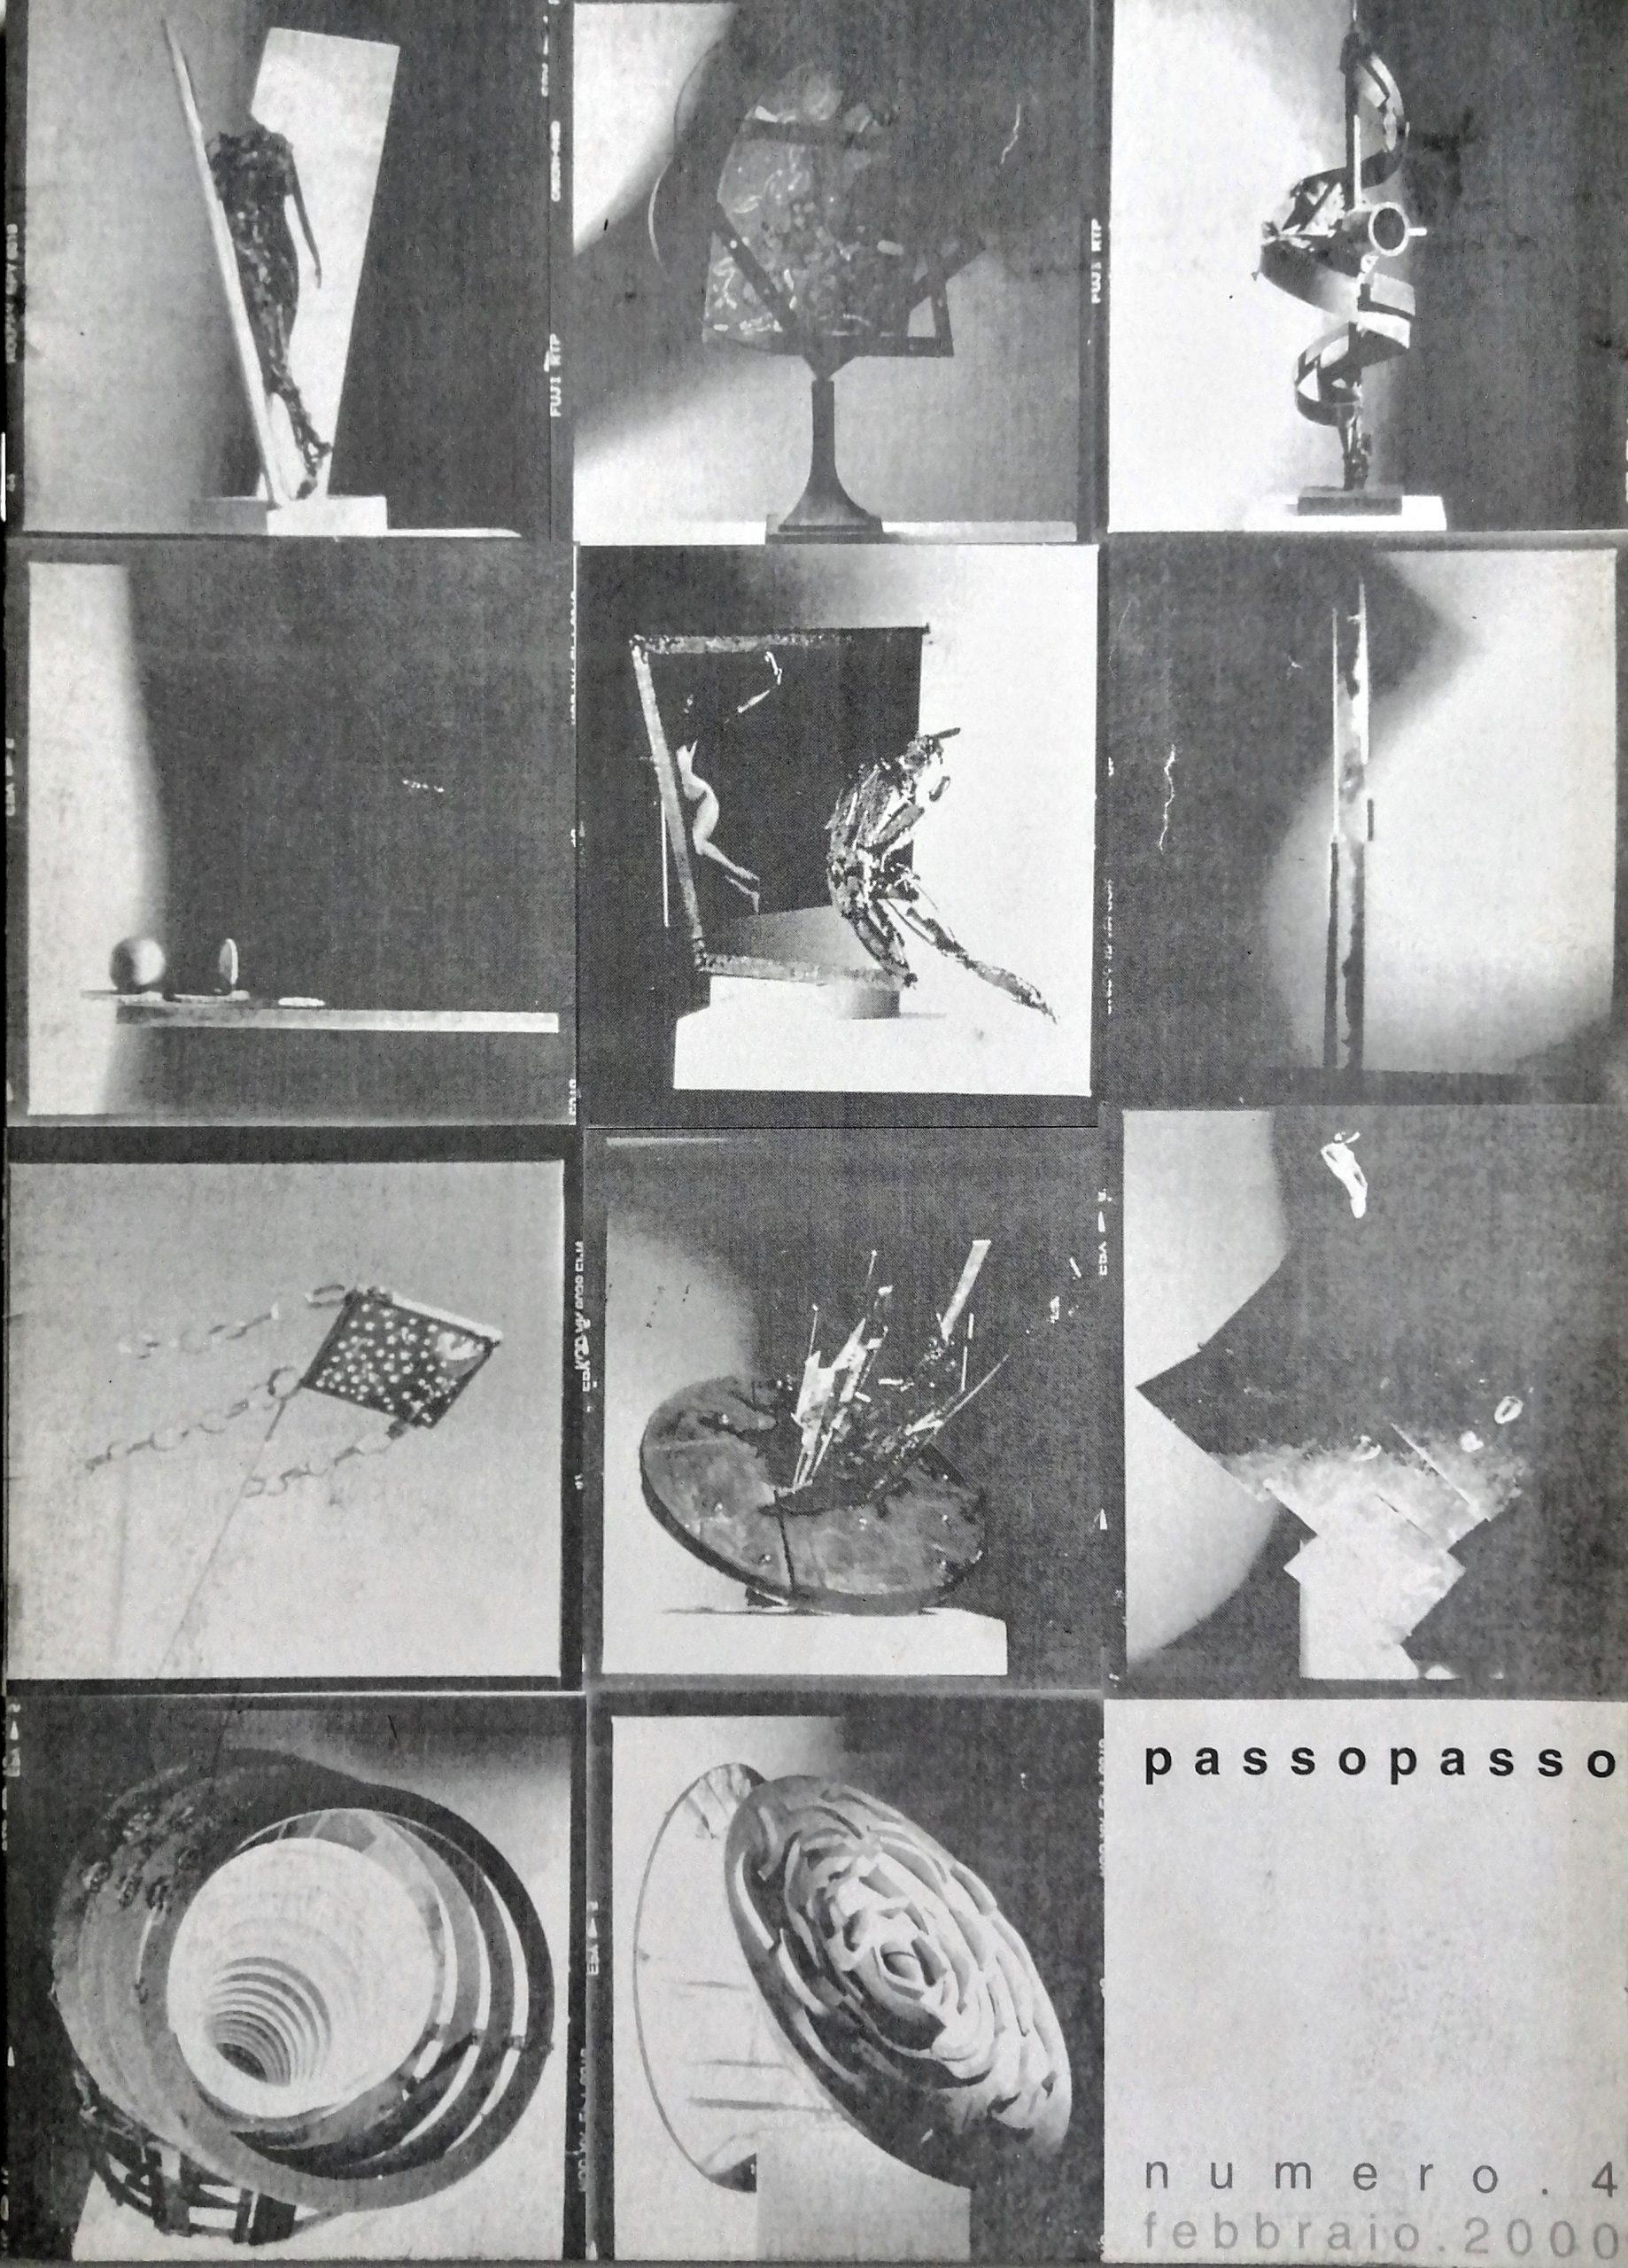 2000 Passopasso 4 rivista catalogo scaled - Bibliography/ Catalogues